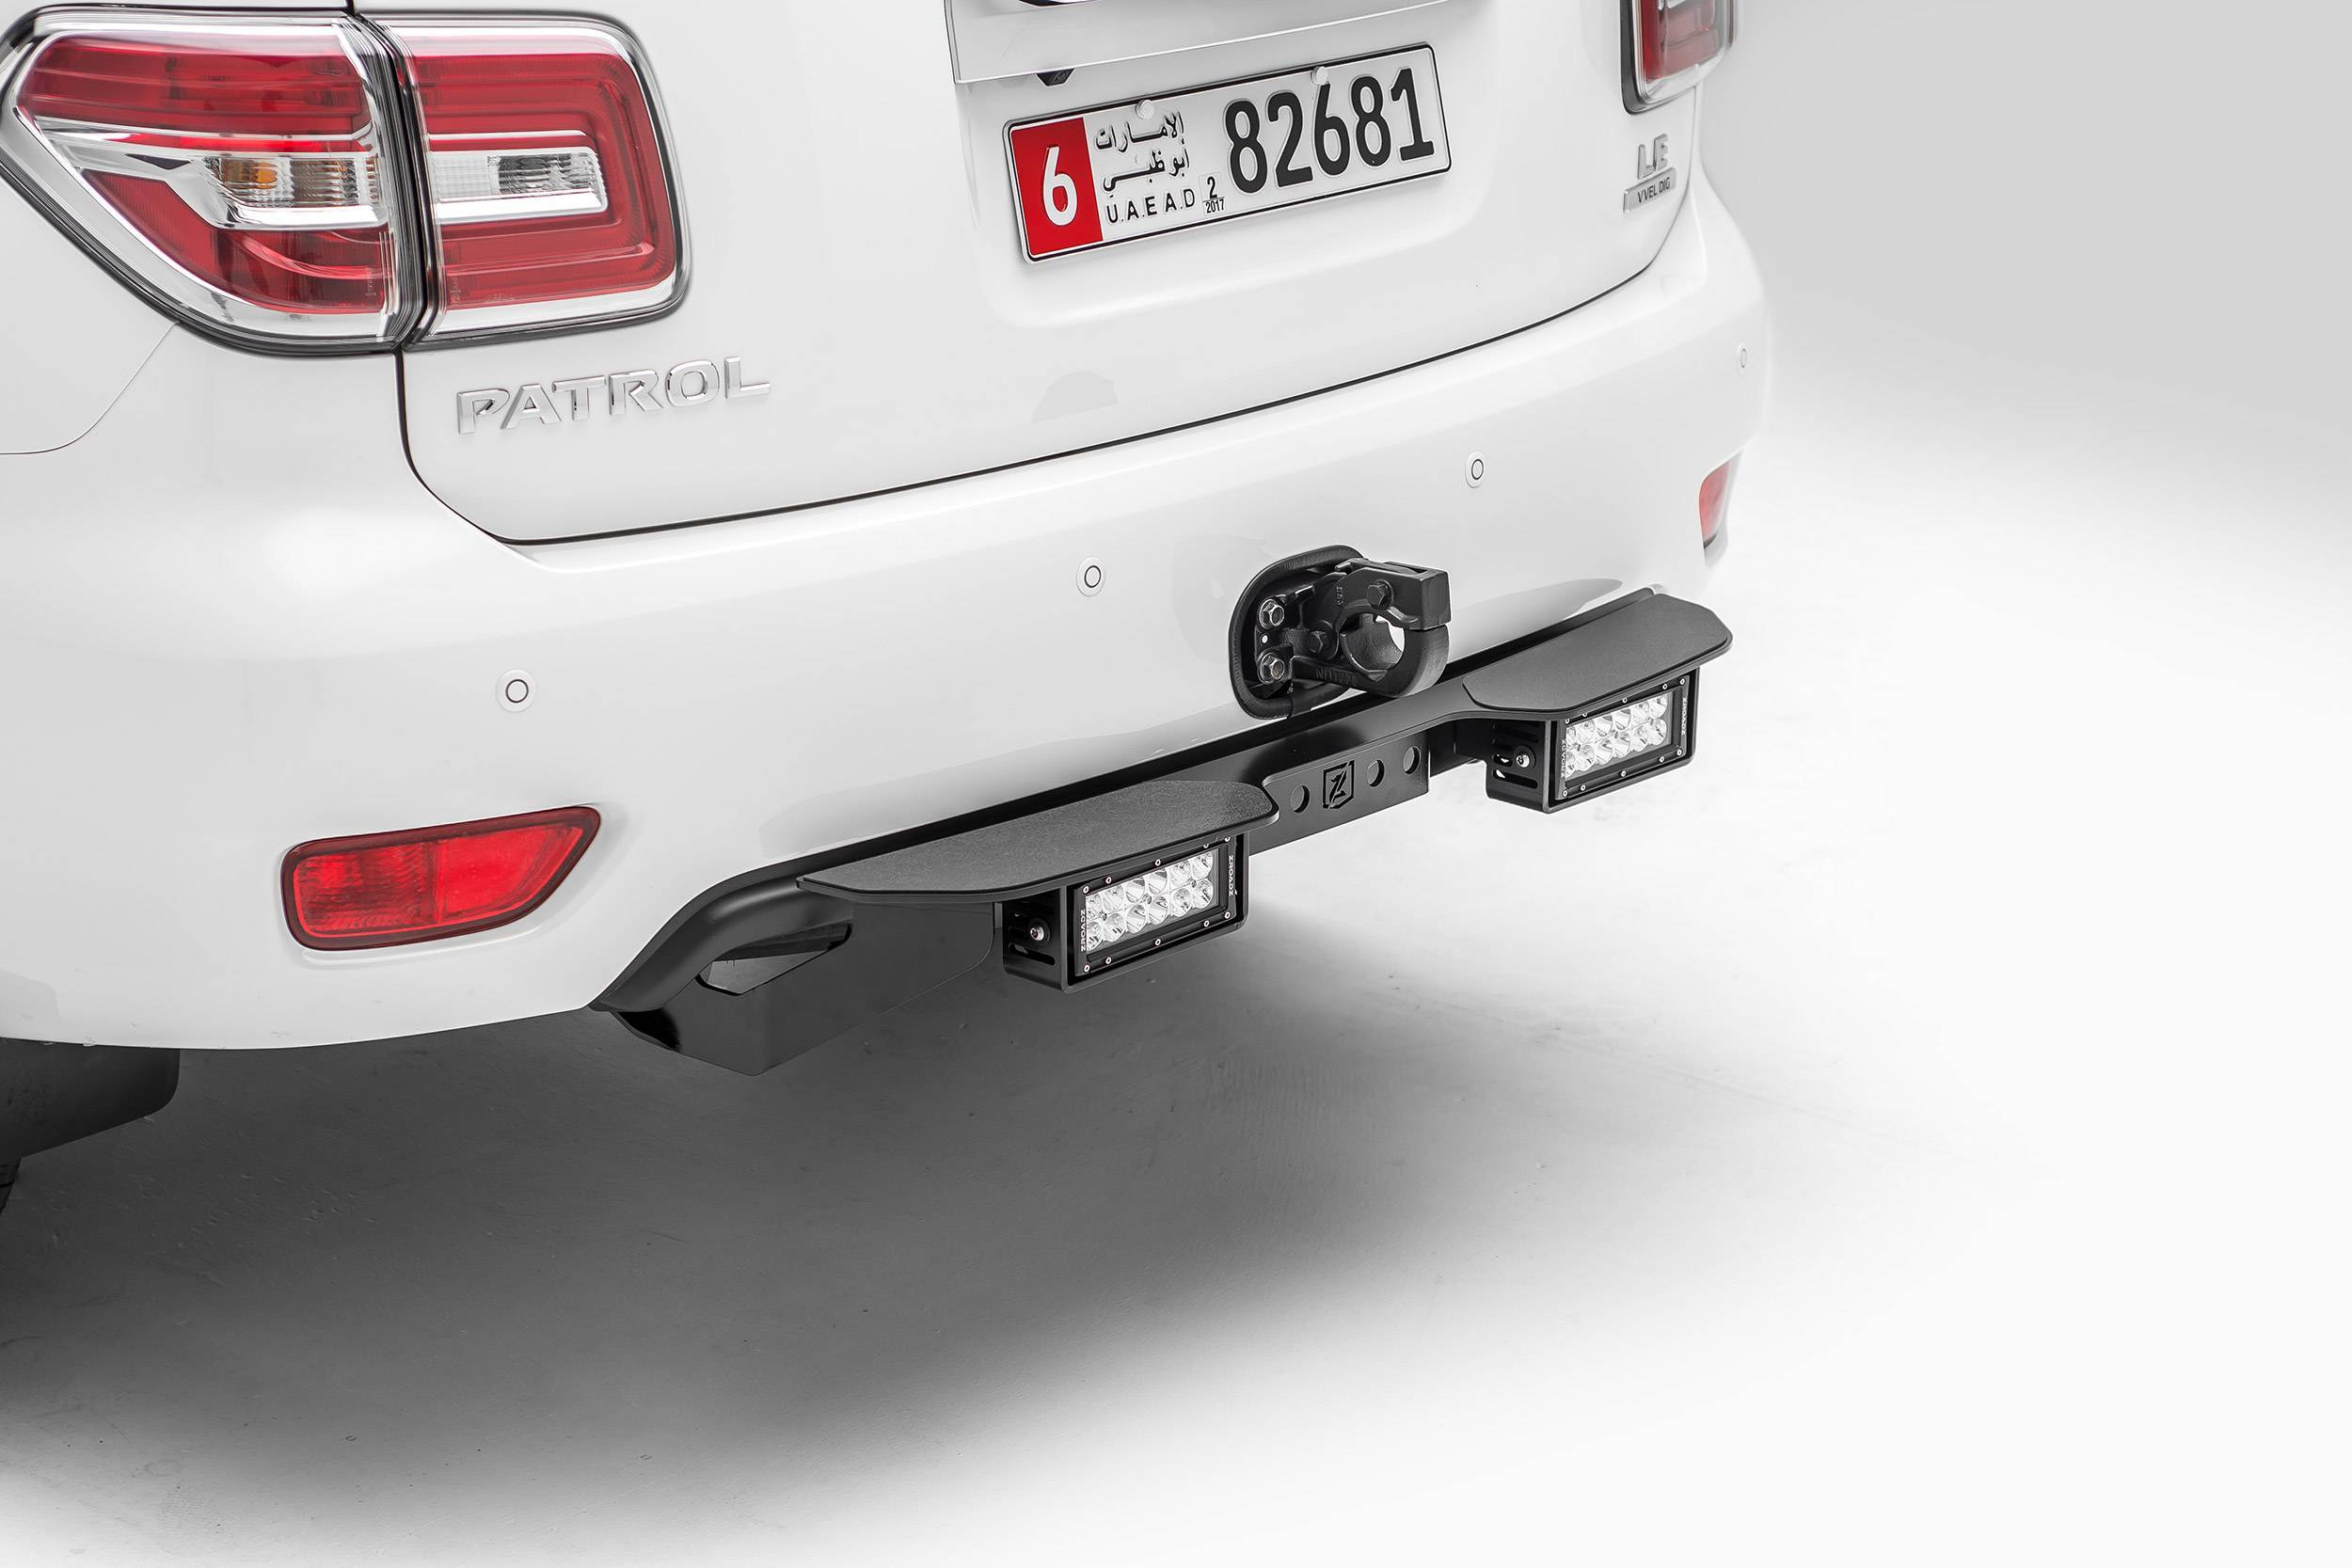 ZROADZ - 2010-2017 Nissan Patrol Y62 Rear Bumper LED Kit with (2) 6 Inch LED Straight Double Row Light Bars - PN #Z387871-KIT